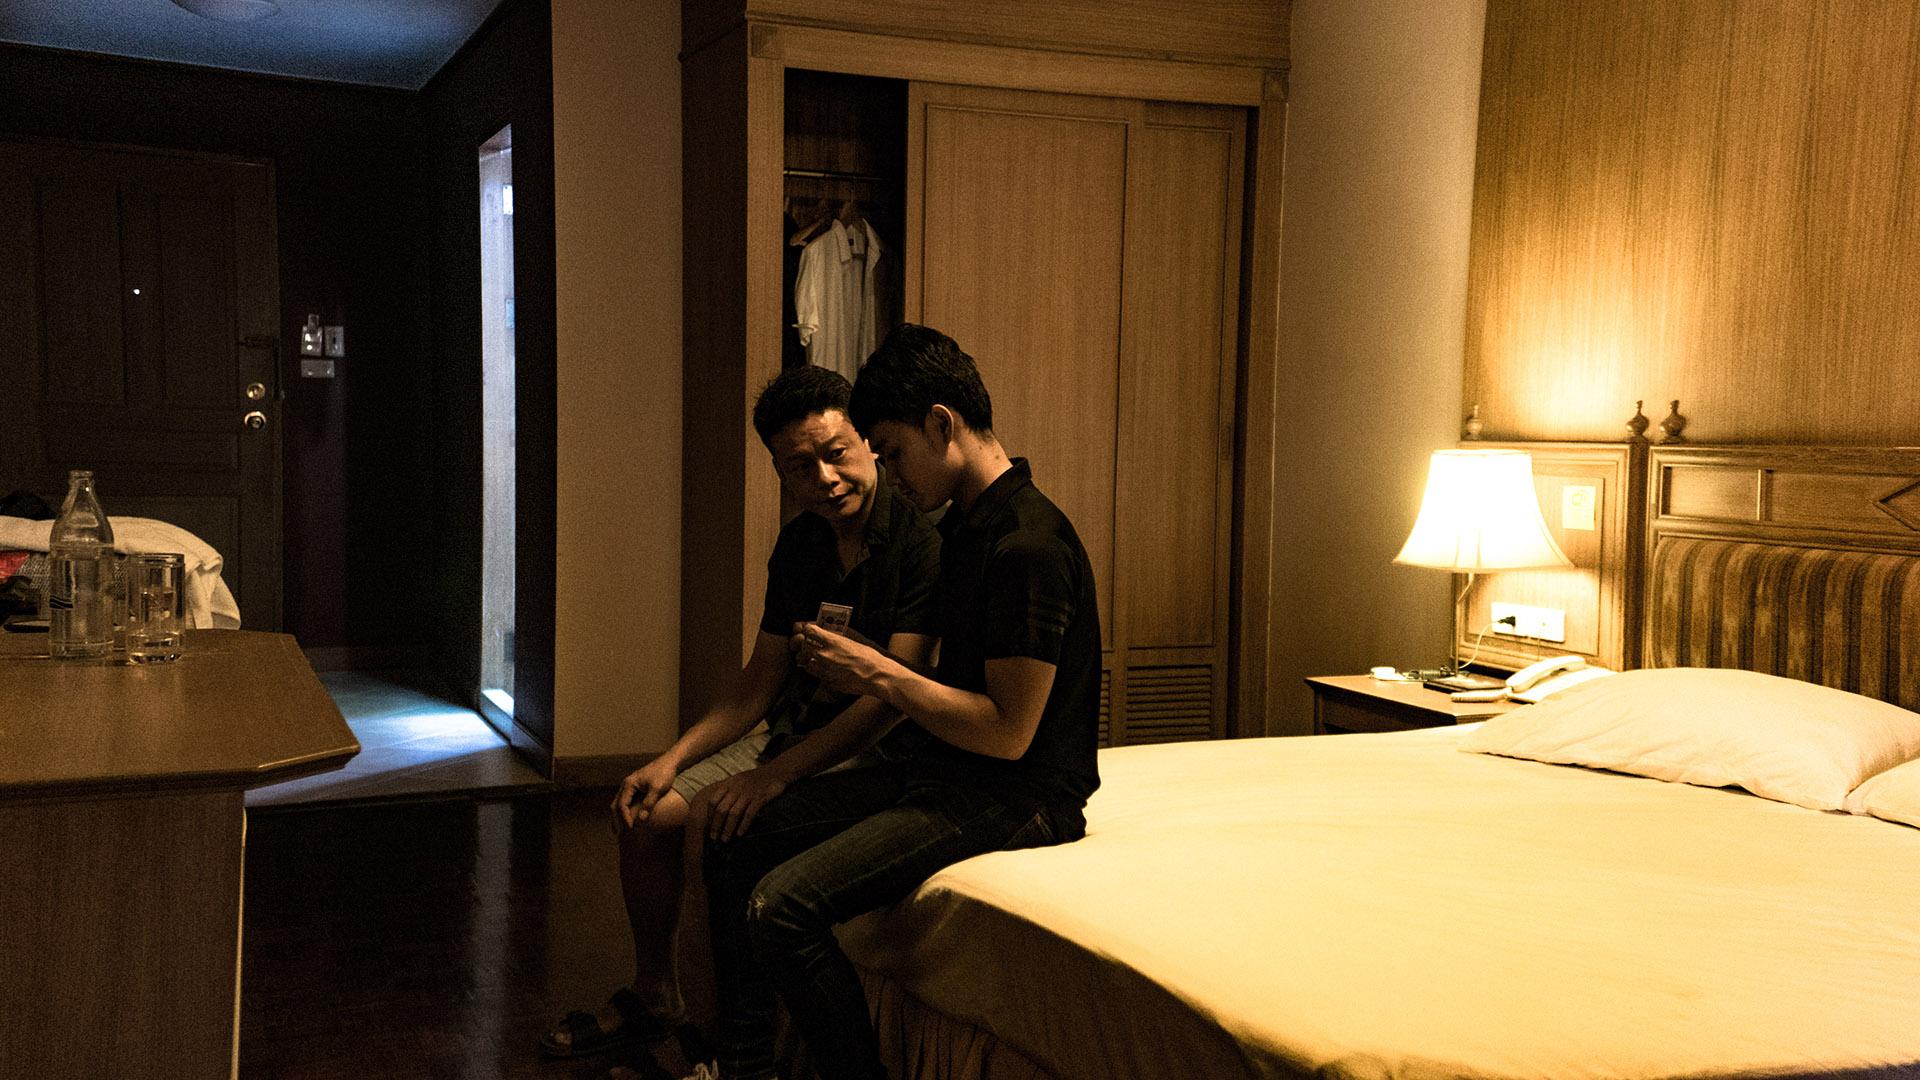 Days (Tsai Ming-Liang)